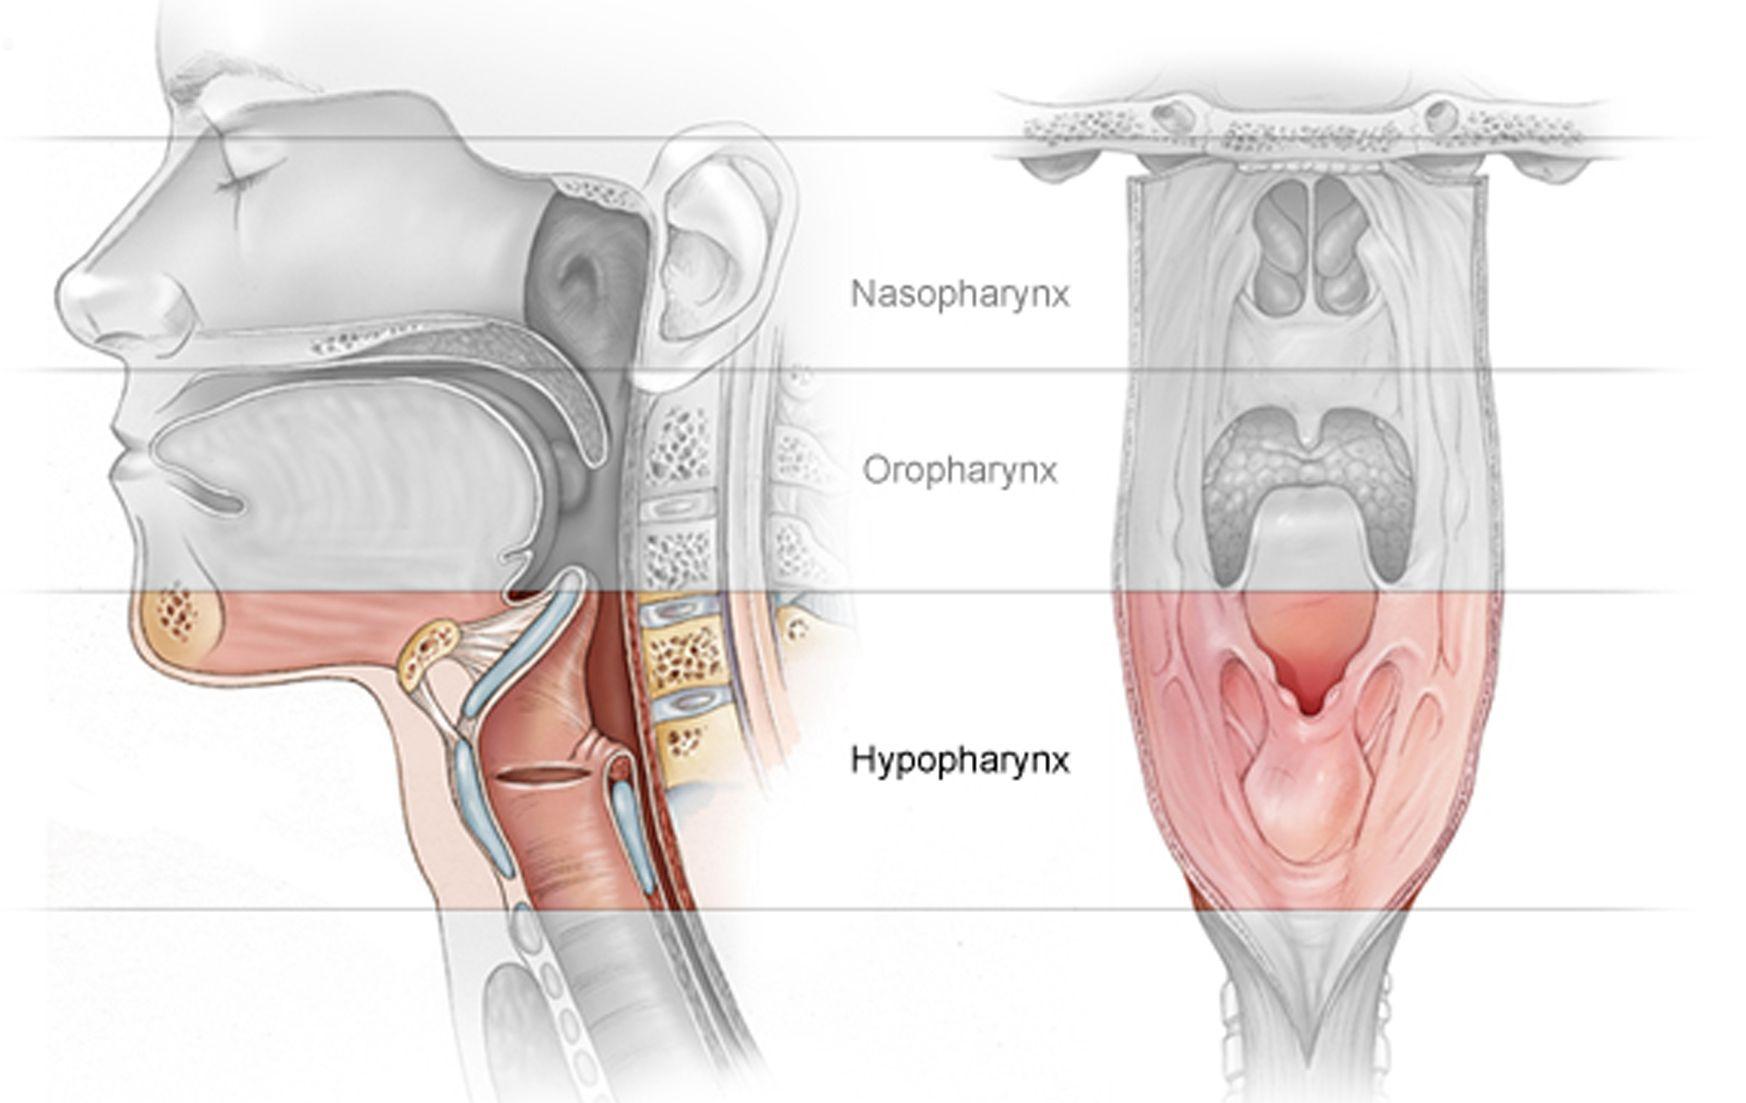 laryngopharynx | Doctor, Doctor | Pinterest | Forensics and ...